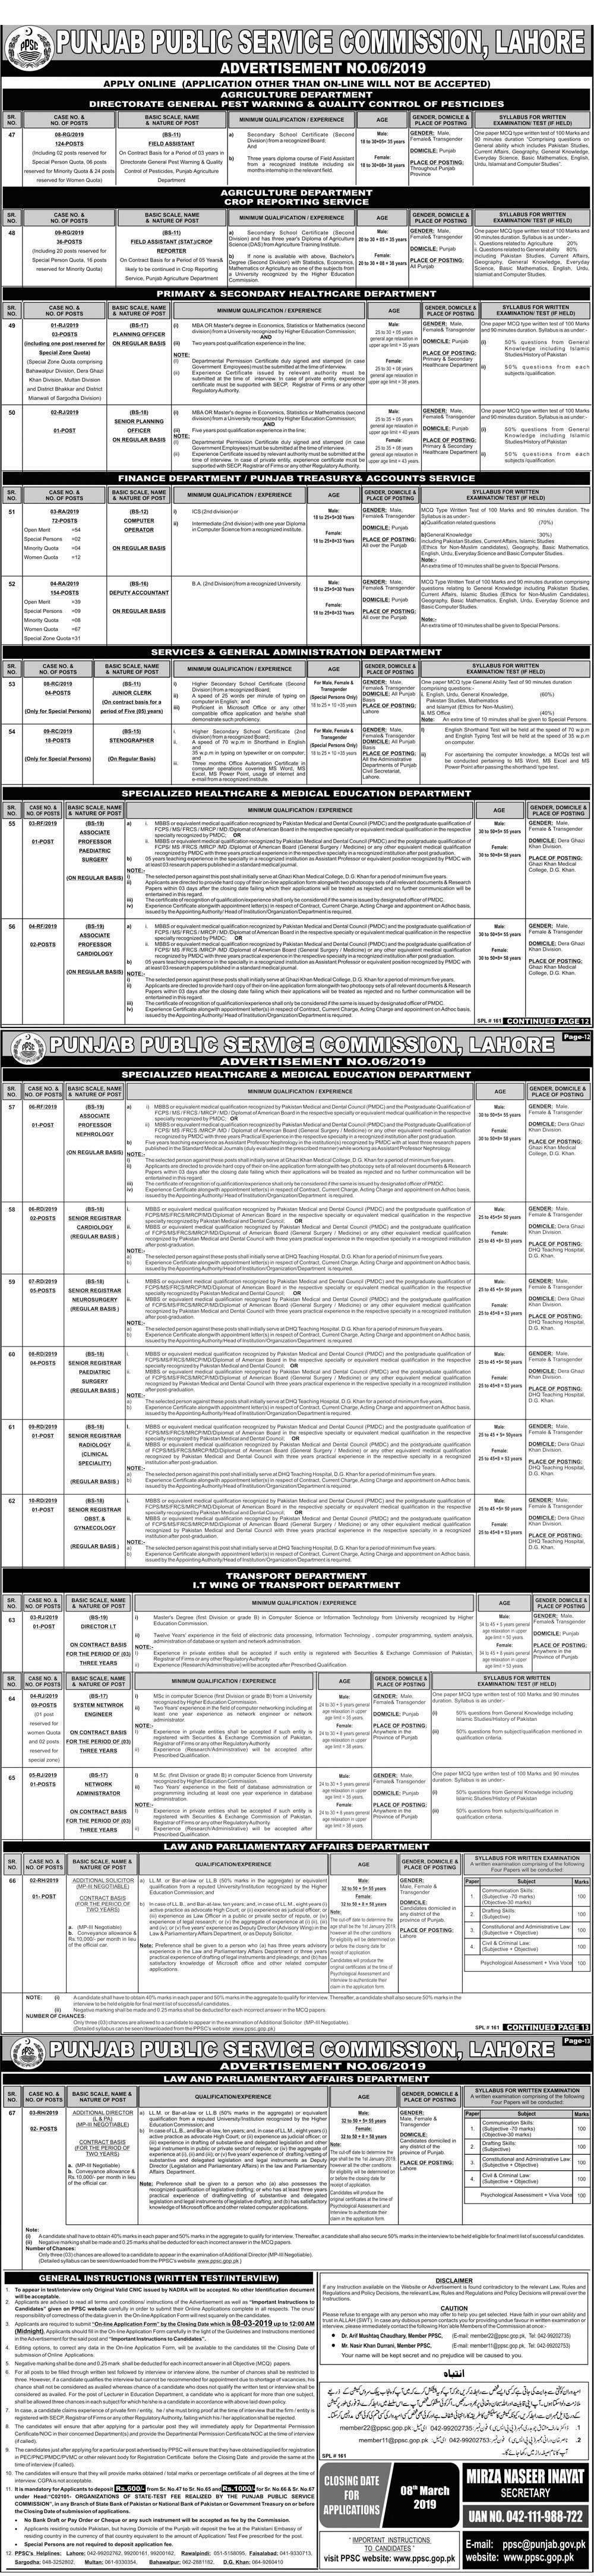 Punjab Public Service Commission PPSC Jobs February 2019 Advertisement